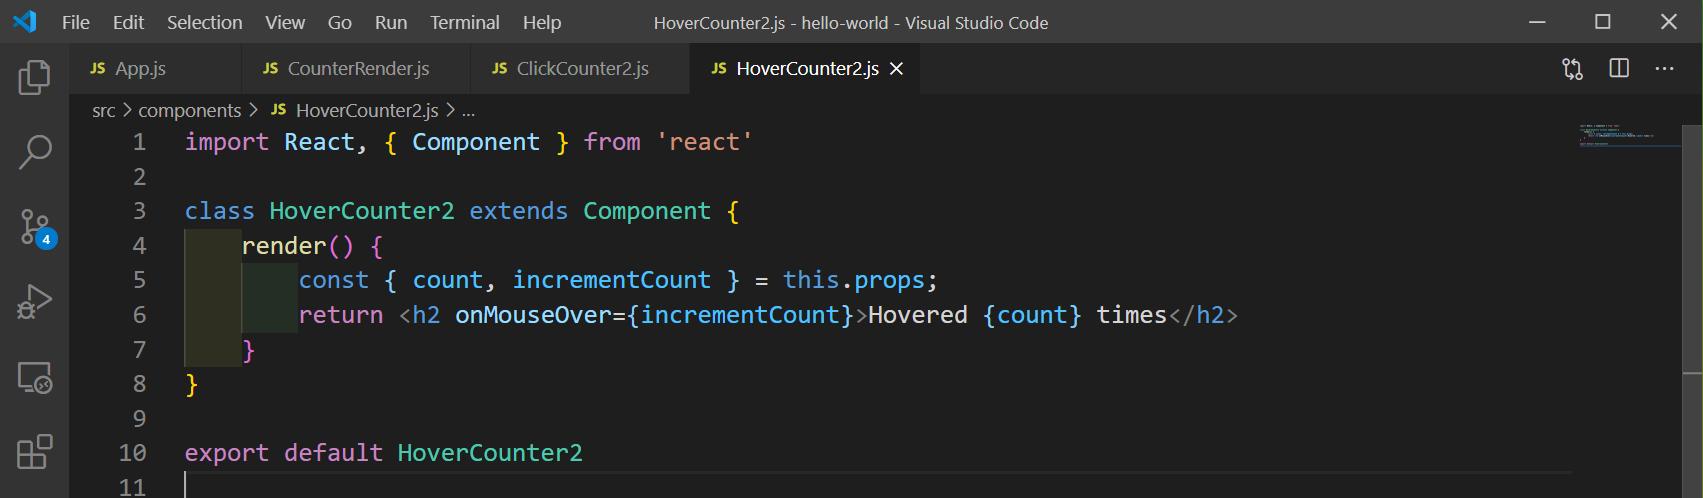 HoverCounter2.js